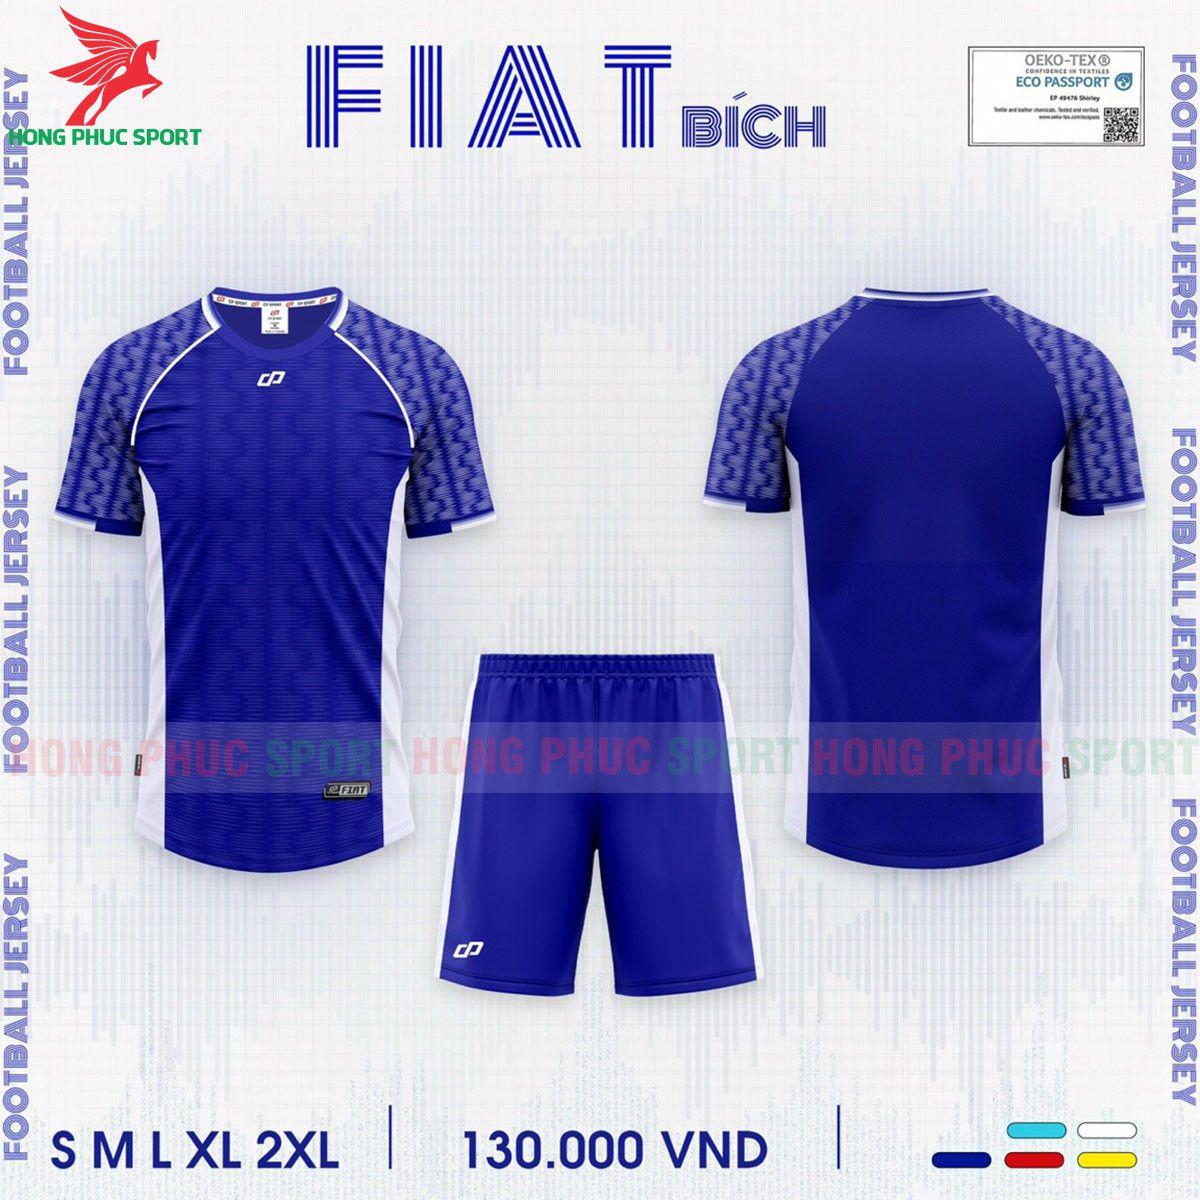 https://cdn.hongphucsport.com/unsafe/s4.shopbay.vn/files/285/ao-bong-da-khong-logo-fiat-xanh-duong-1-60f50471ad1e1.jpg